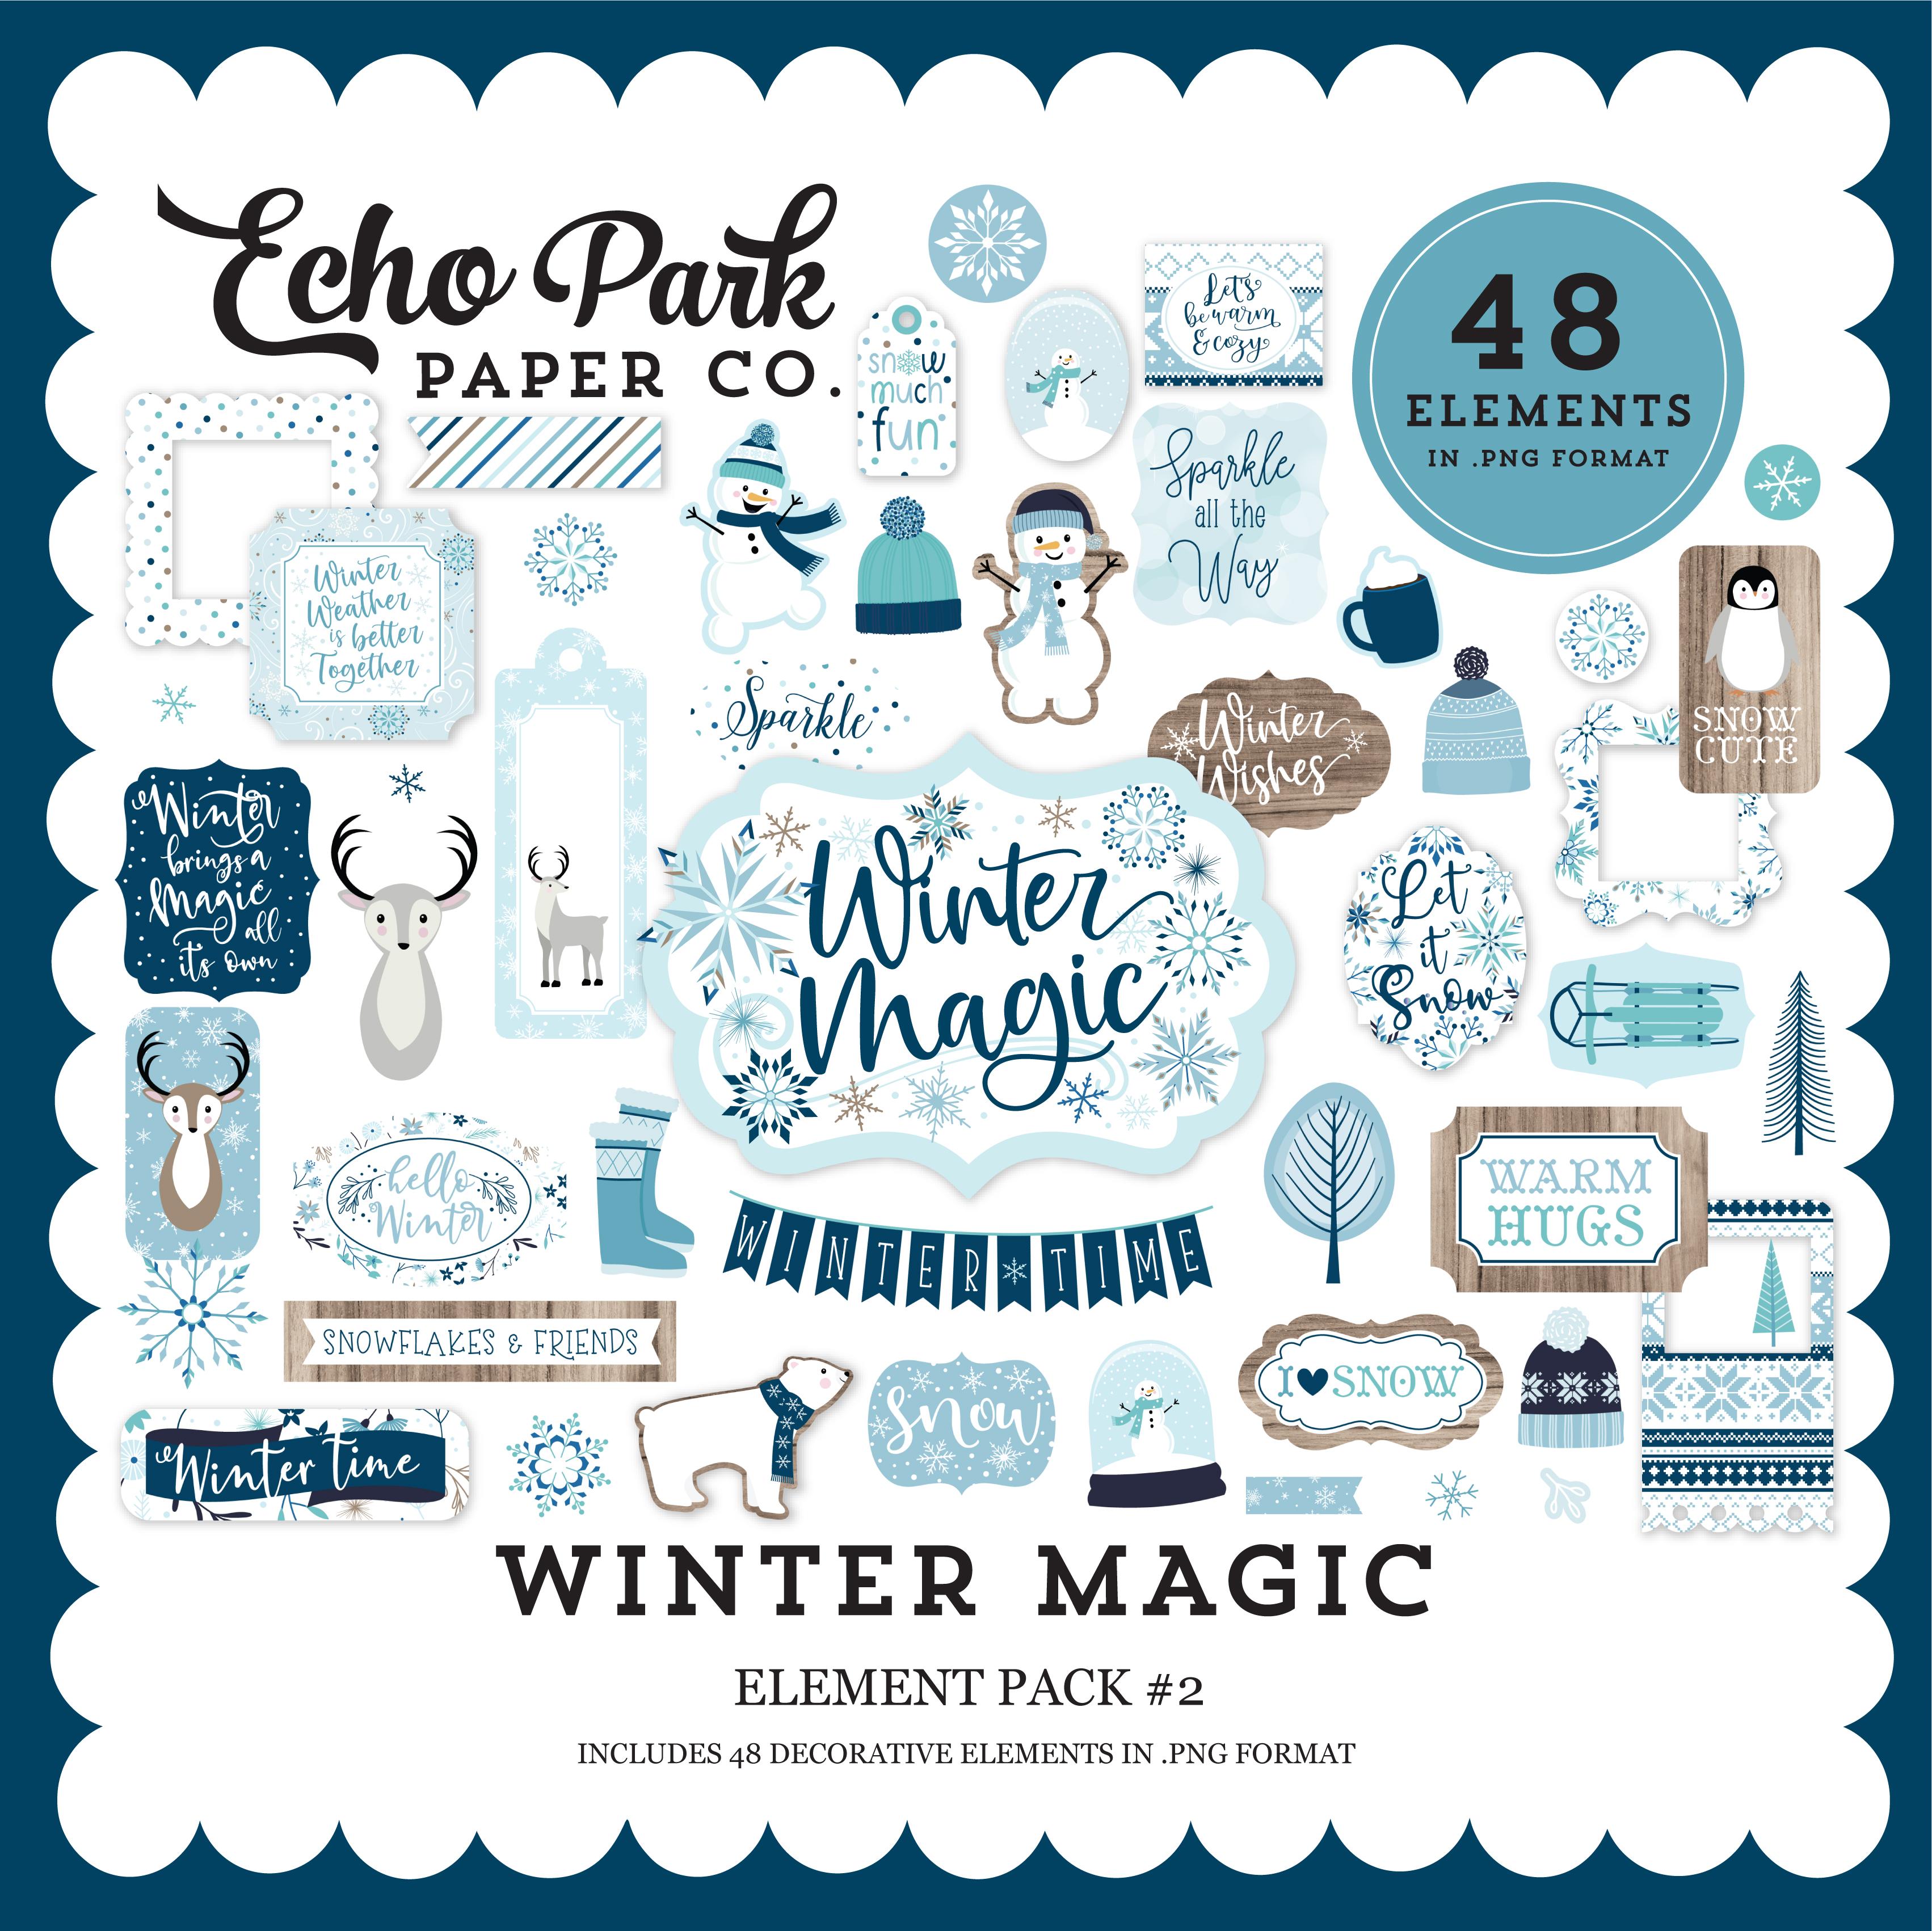 Winter Magic Element Pack #2